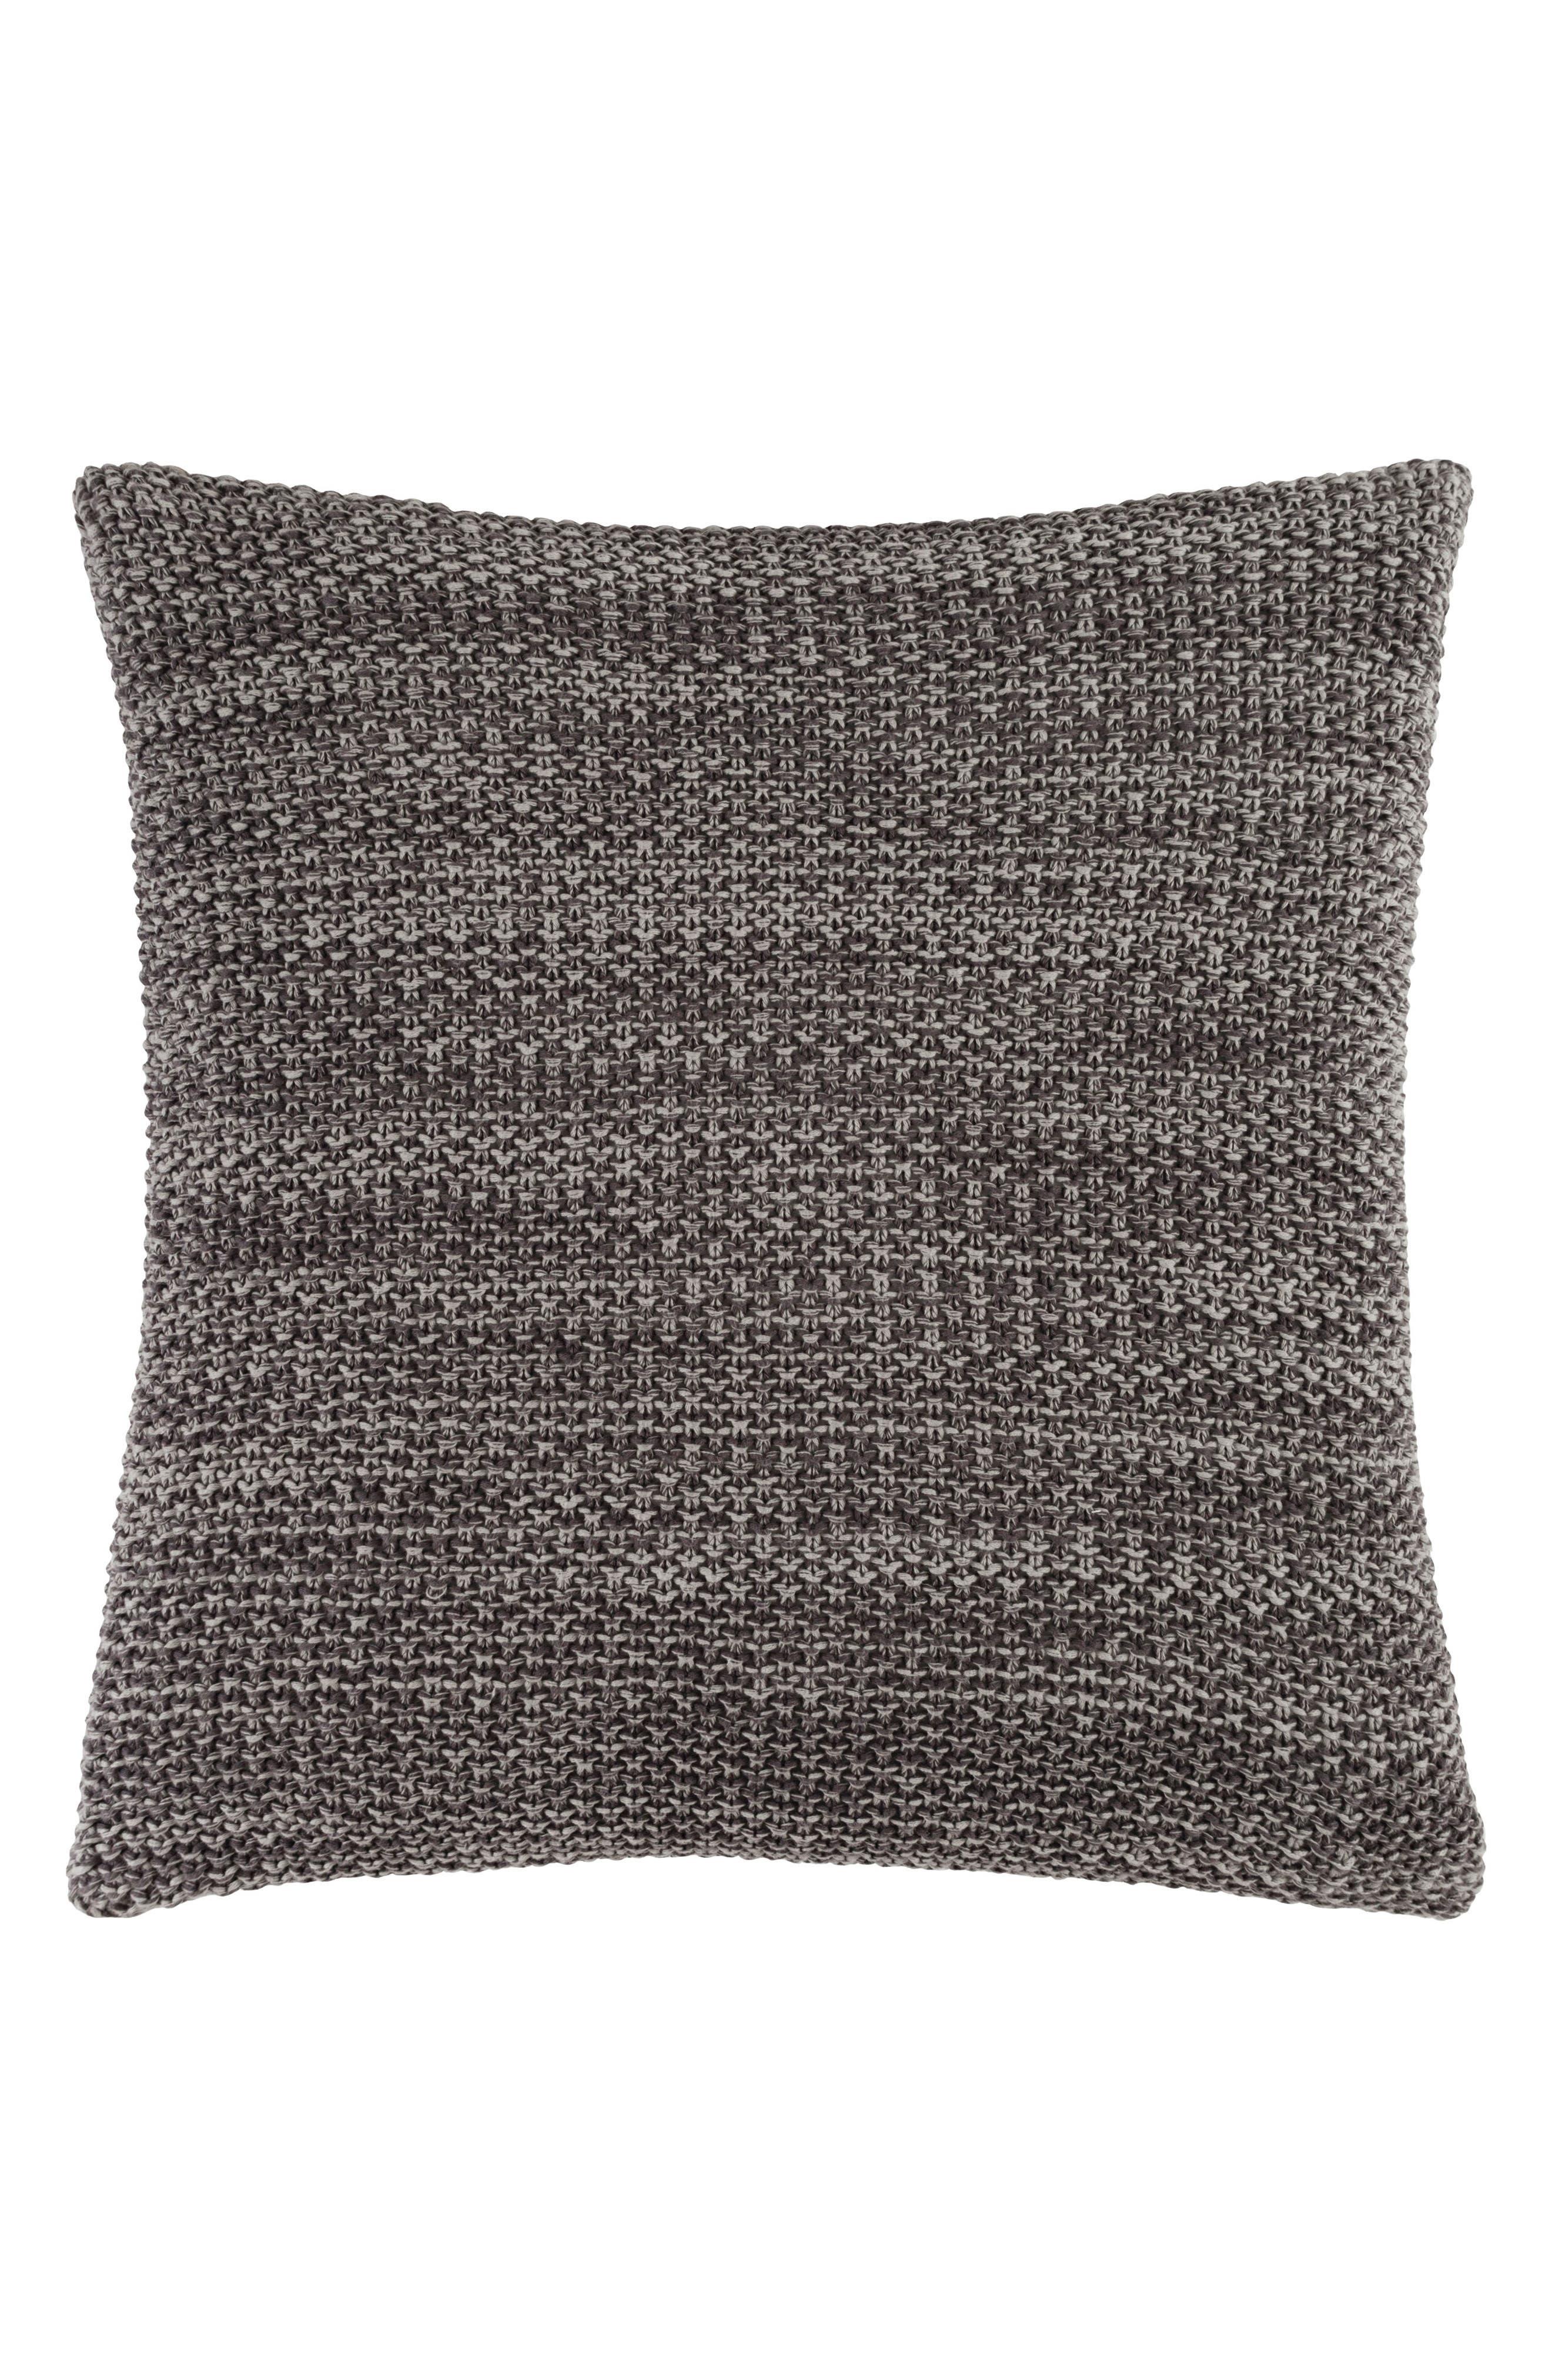 Orino Accent Pillow,                             Main thumbnail 1, color,                             GREY/ CHARCOAL